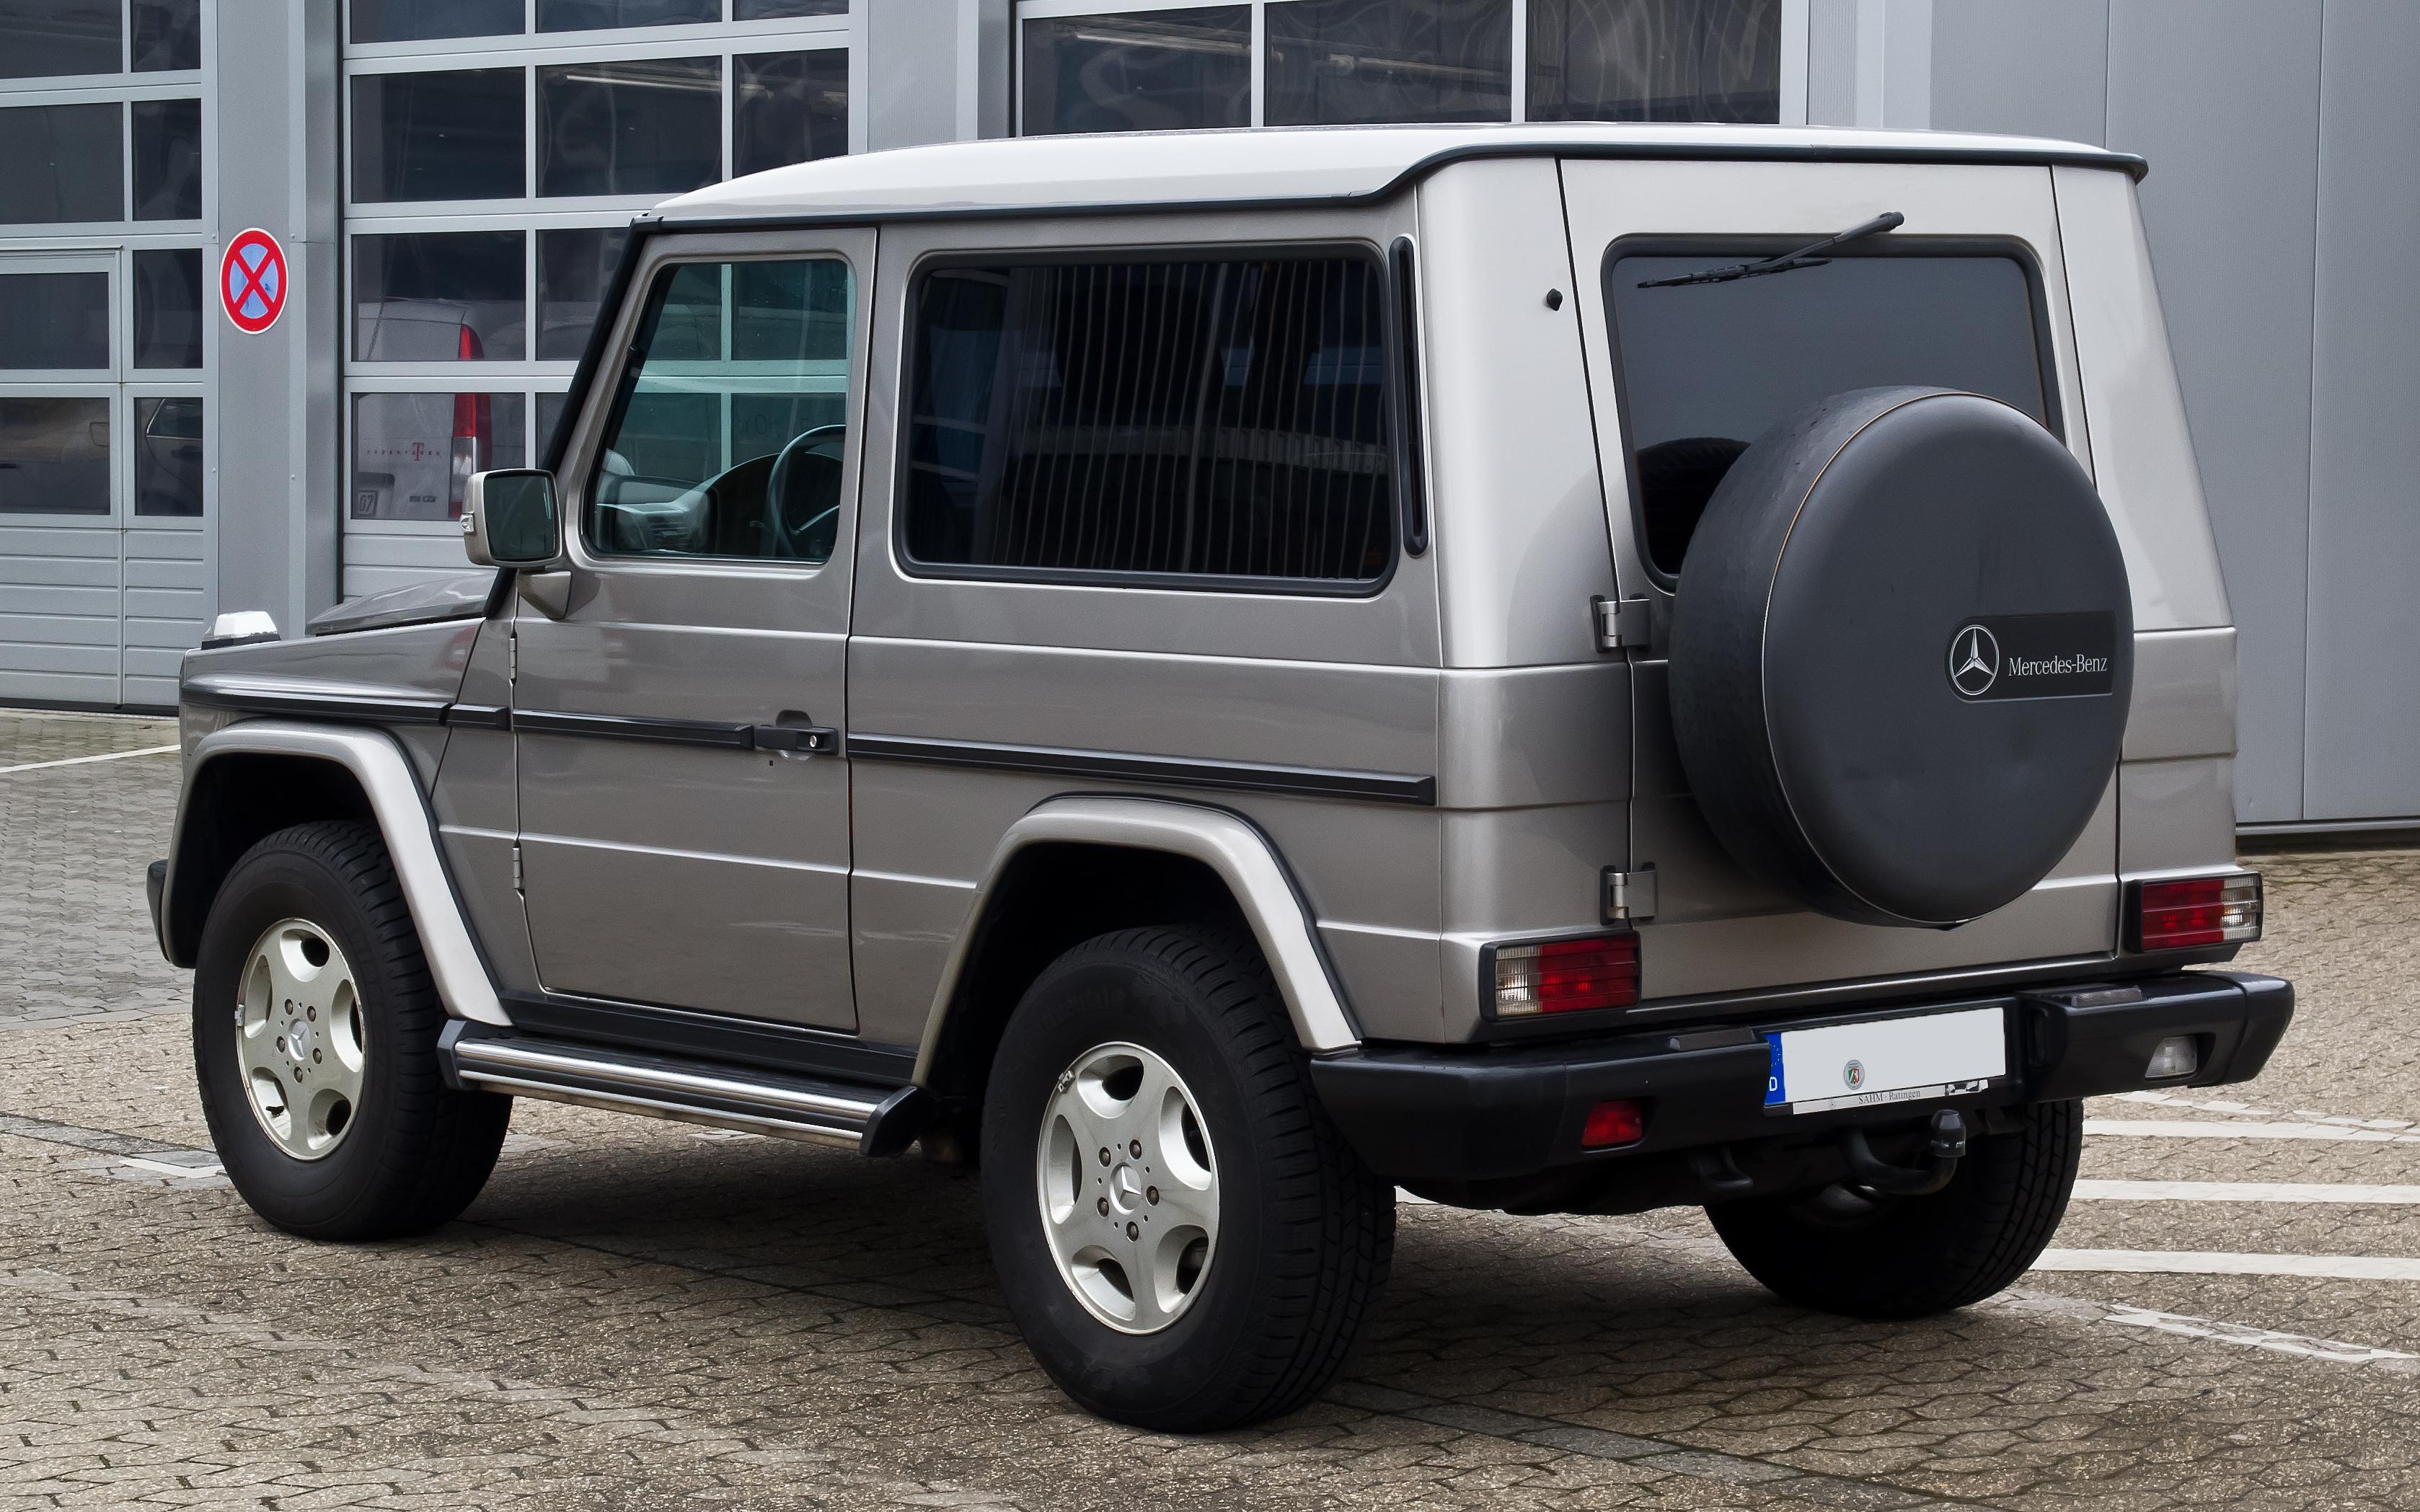 File:Mercedes-Benz G 270 CDI (W 463) – Heckansicht, 3